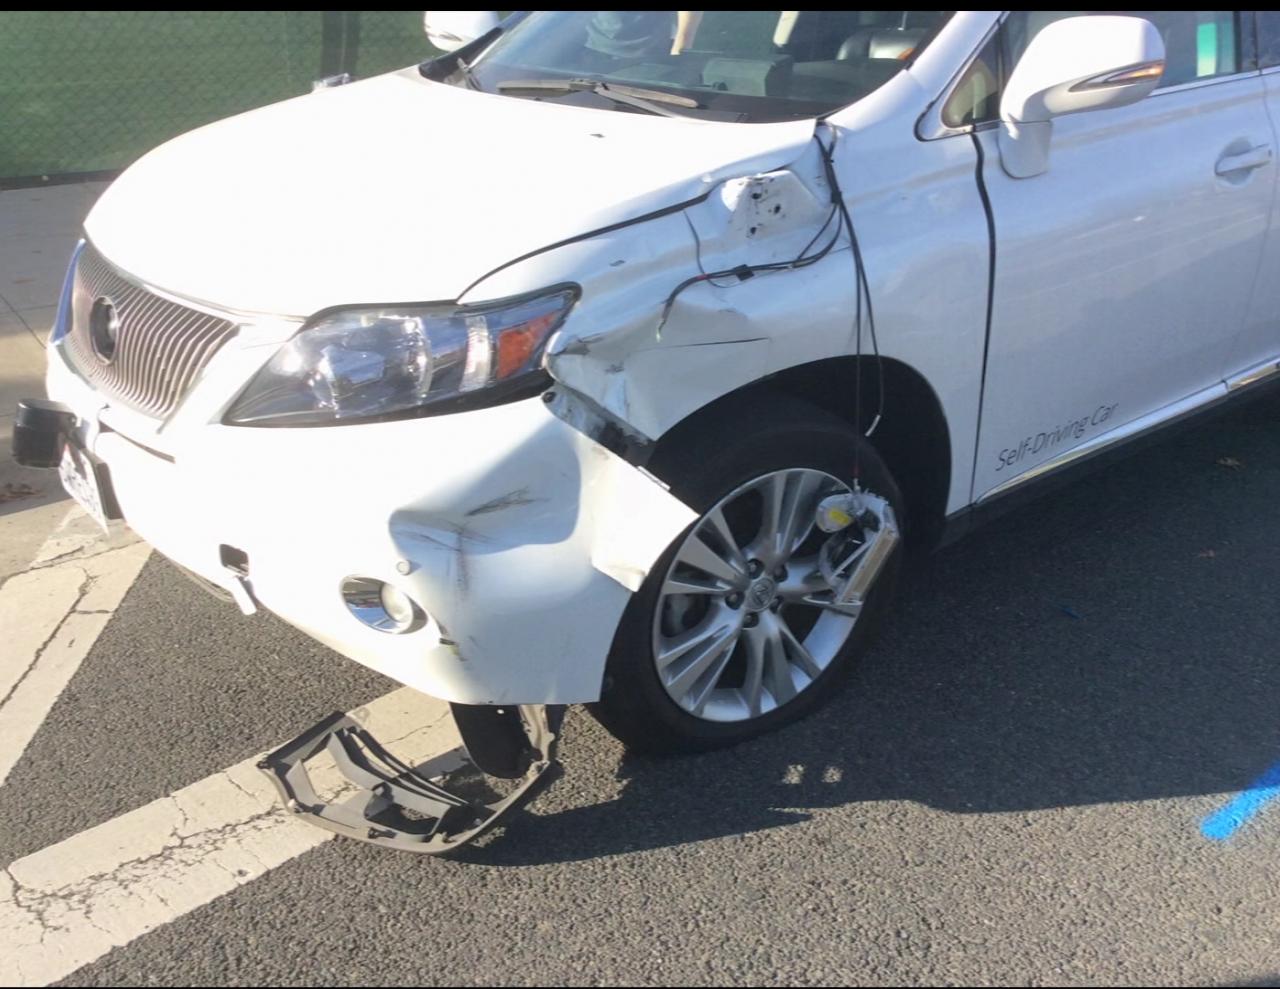 video incidente google guida autonoma